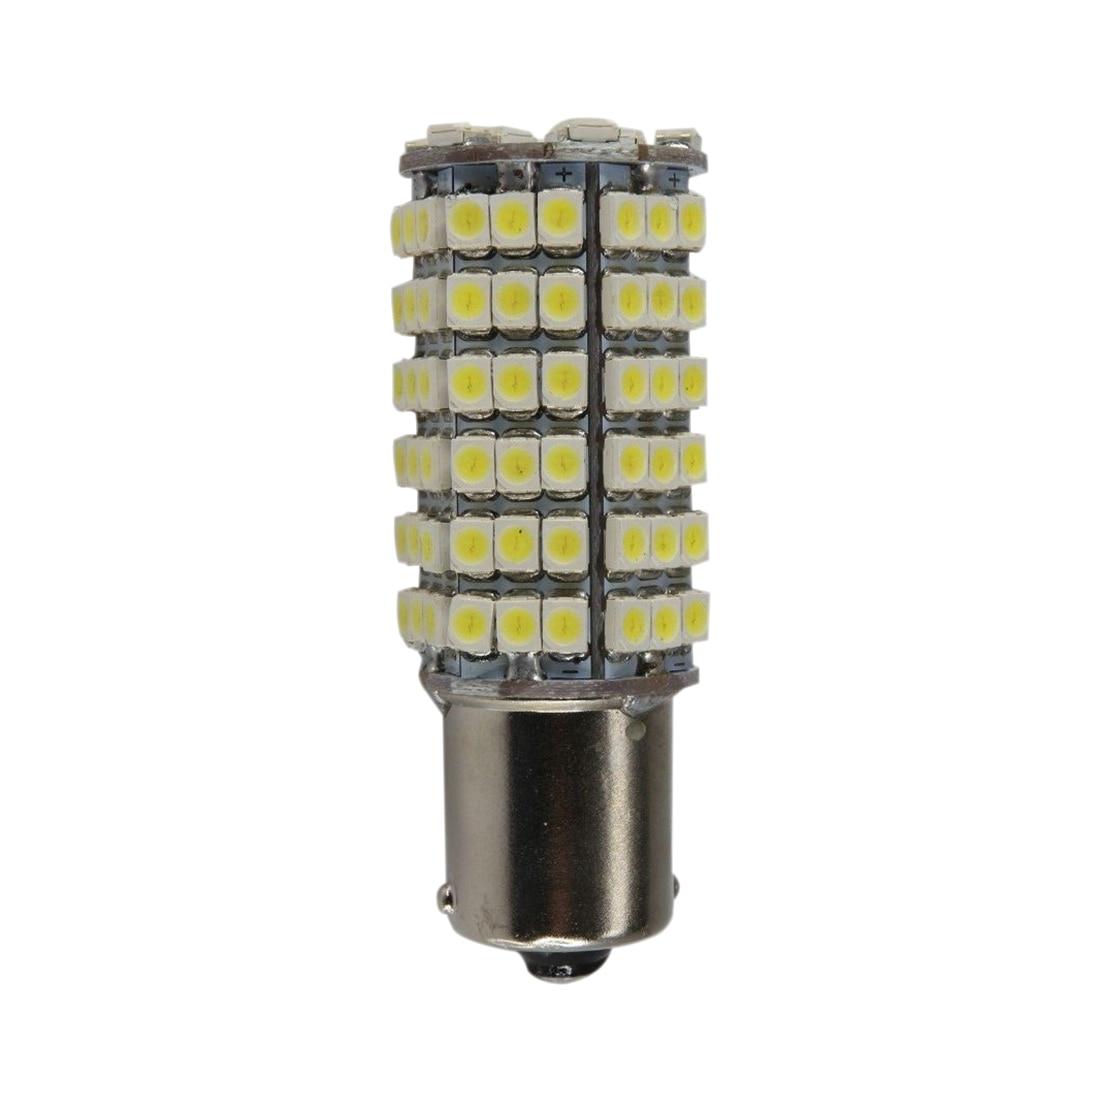 6X 1156 BA15S 120 LED RV Trailer Camper Interior LED Lights Bulbs 6000K Xenon White